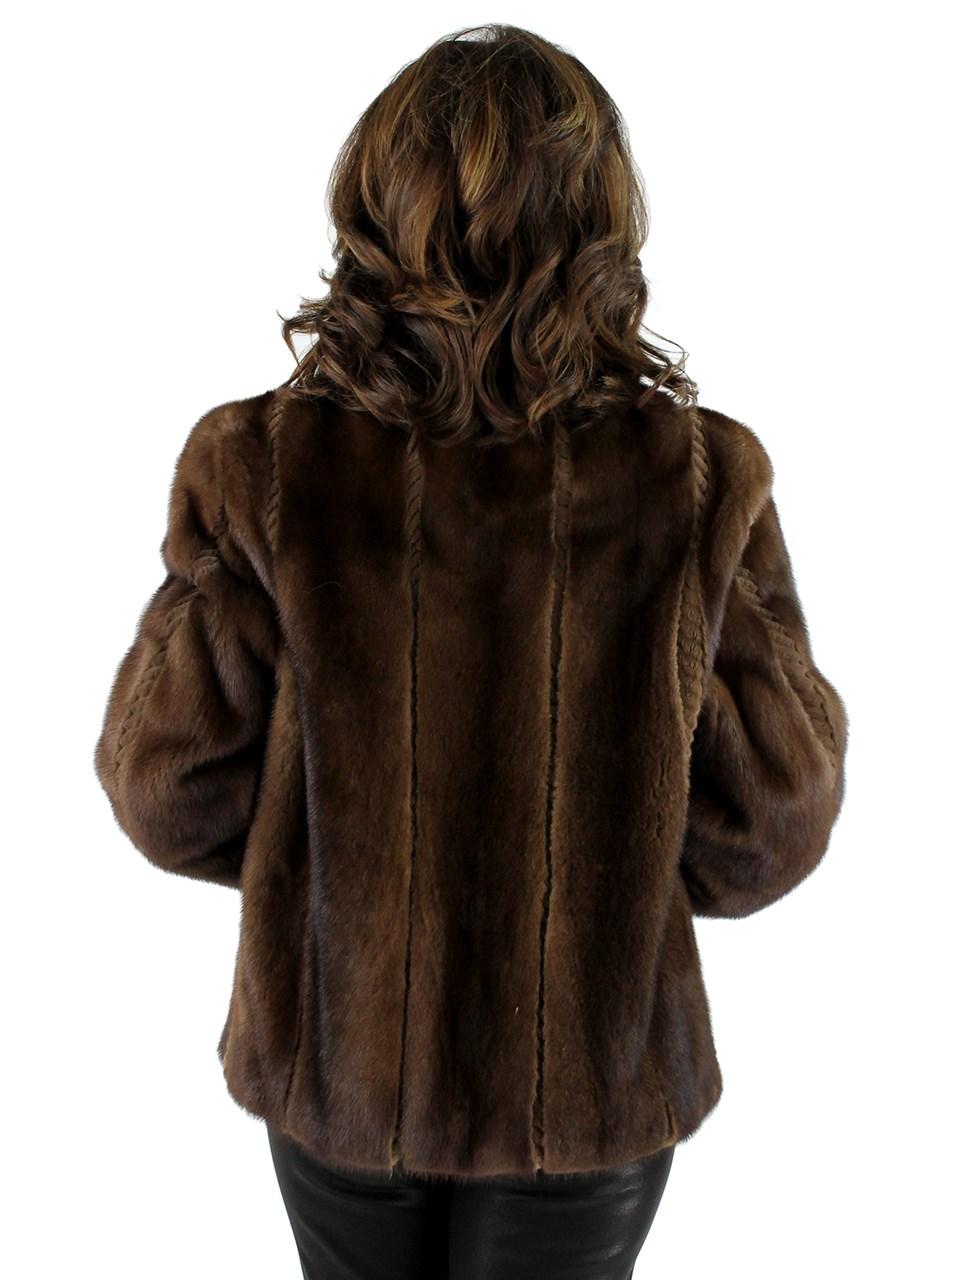 Demibuff Female Mink Jacket with Sheared Mink Details